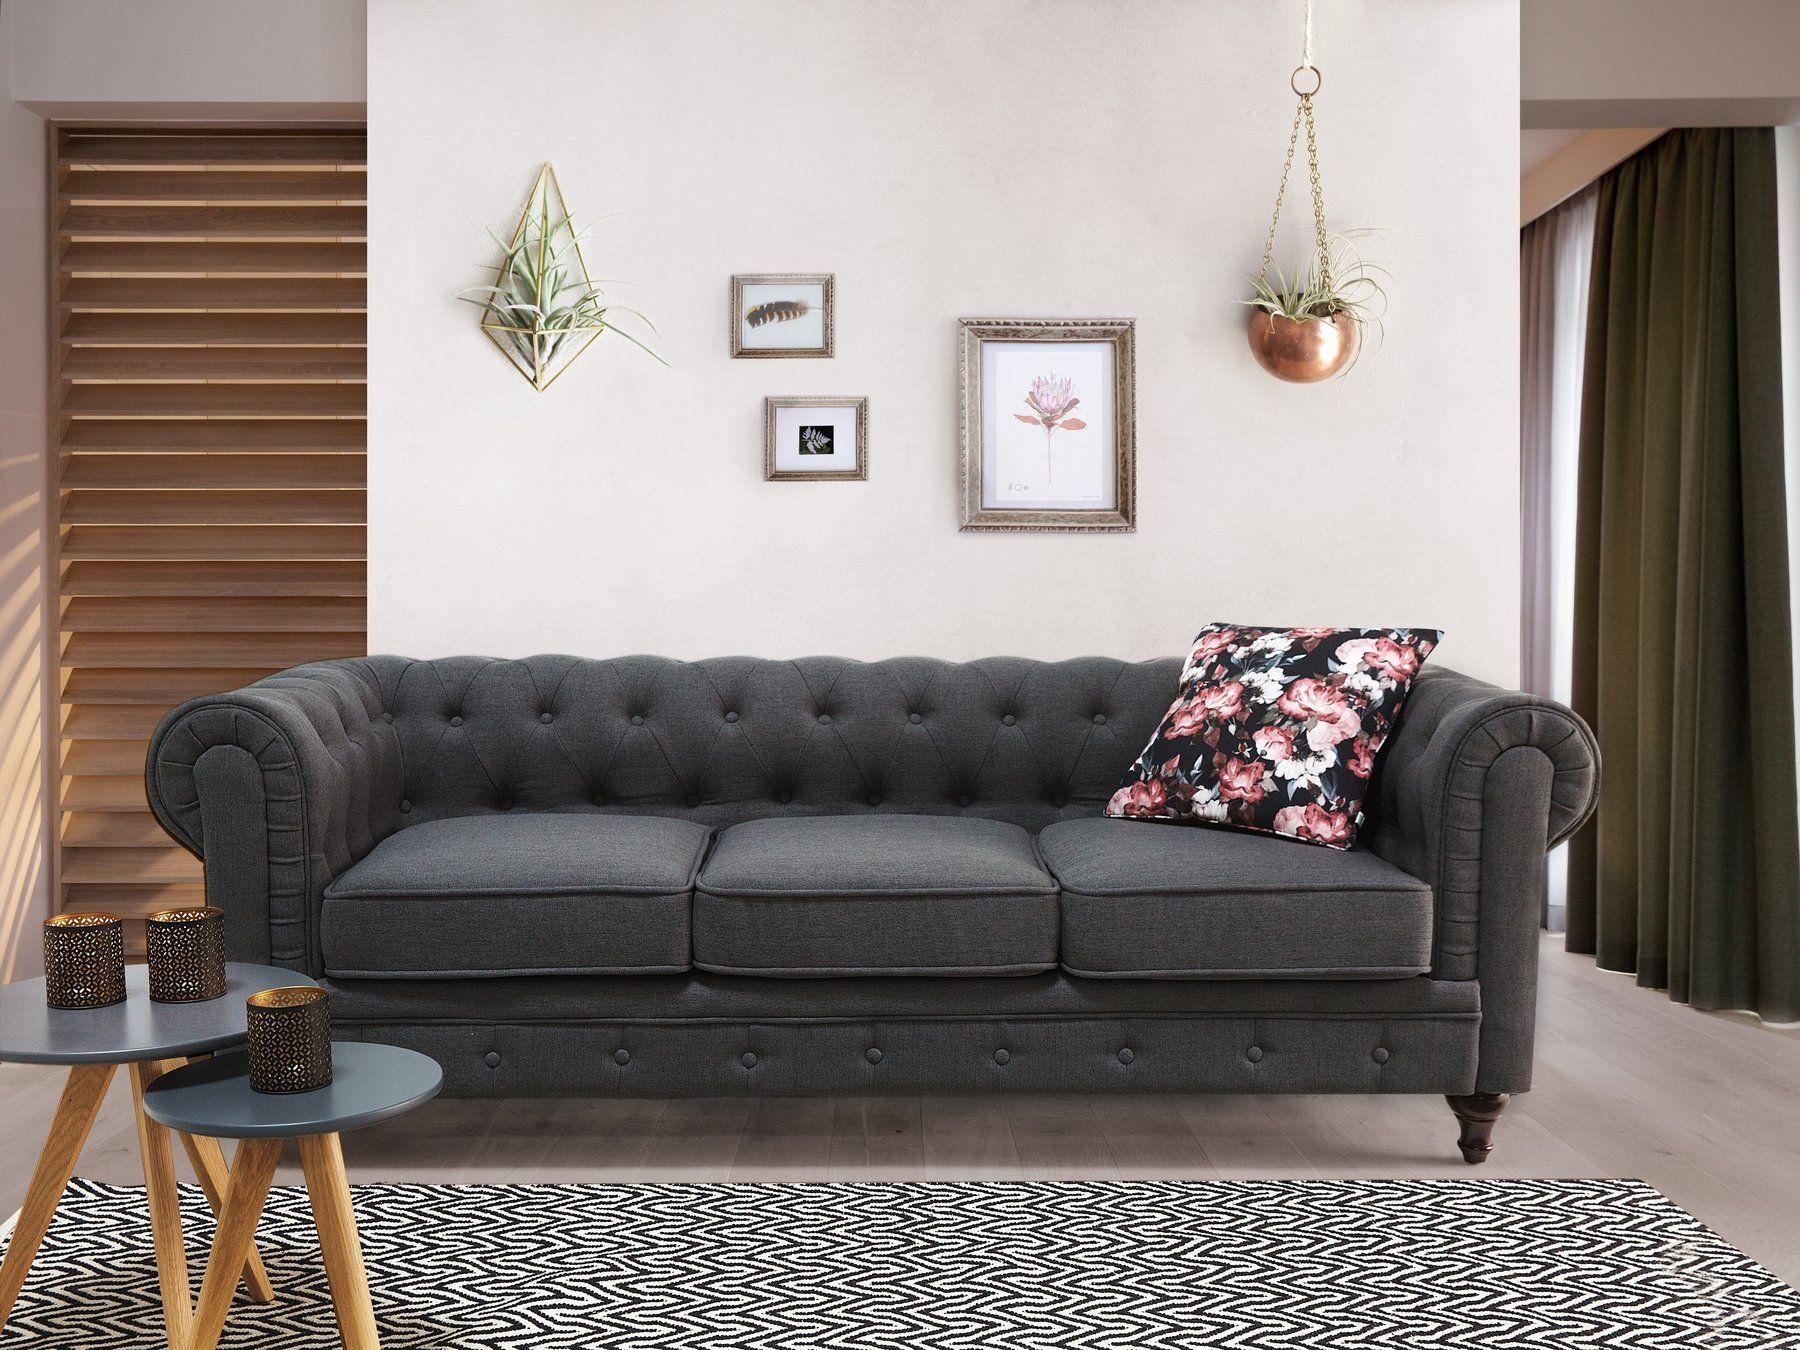 Beliani Modern 3seater Sofa Gray Fabric Chesterfield Want